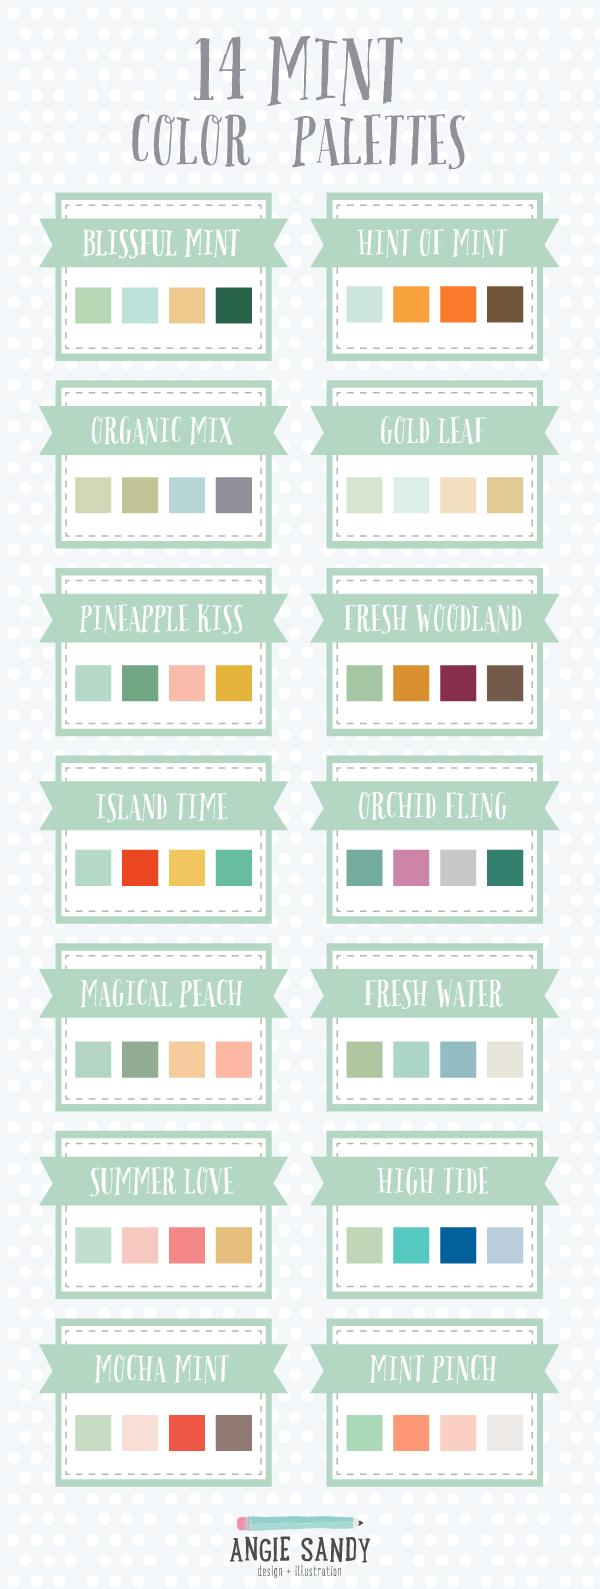 14 Mint Color Palettes Angie Sandy Art Licensing Design